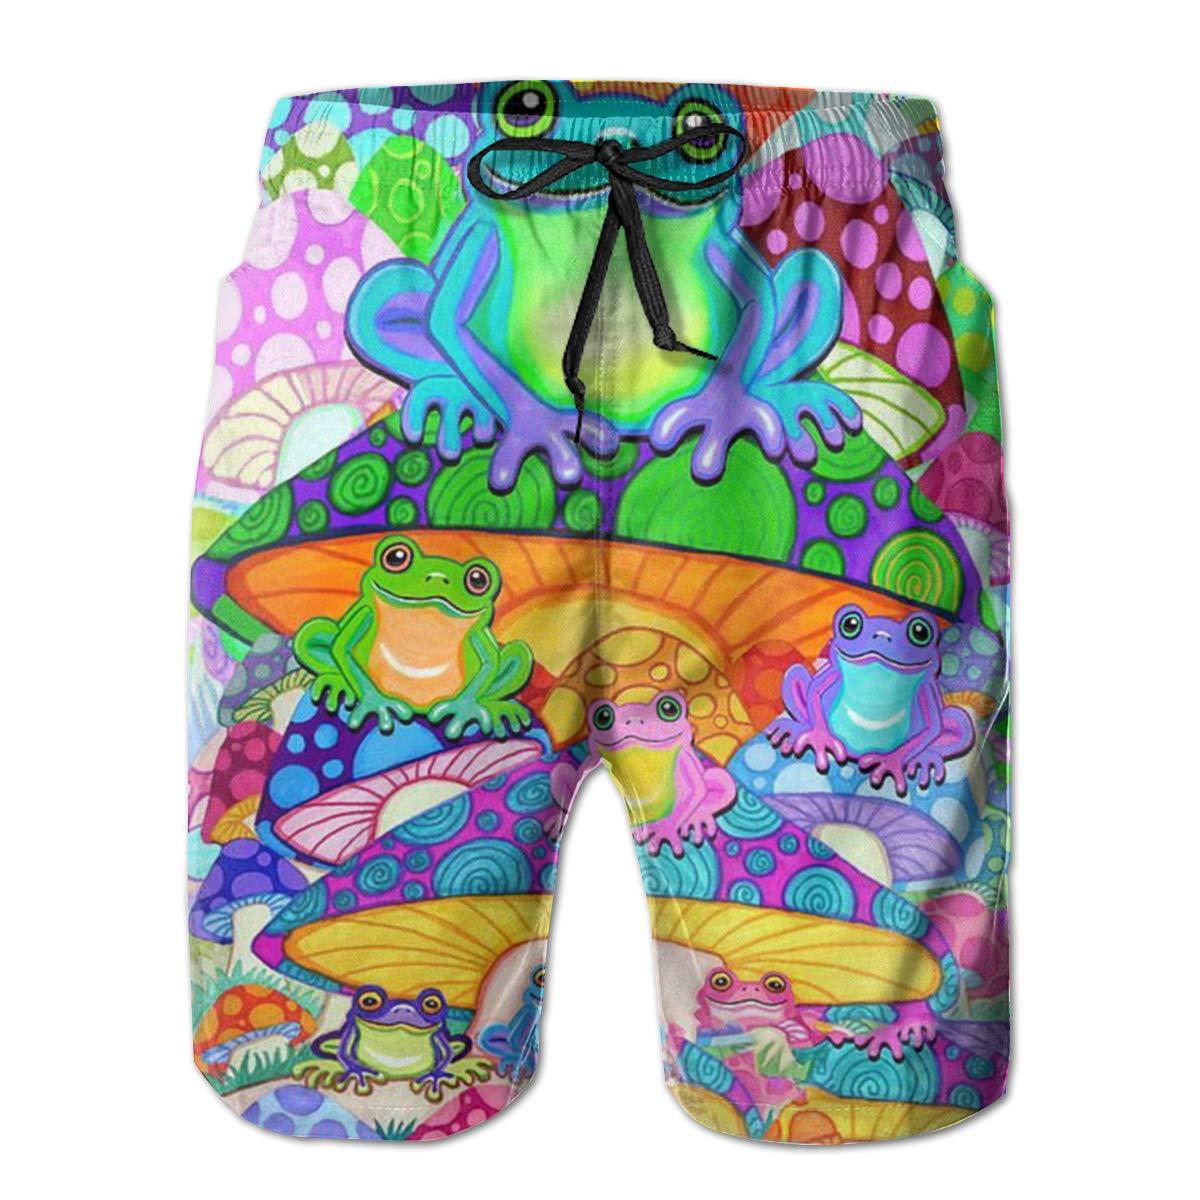 WMDJEG Mushroom Frogs Mens Summer Beachwear Sports Running Swim Board Shorts Mesh Lining